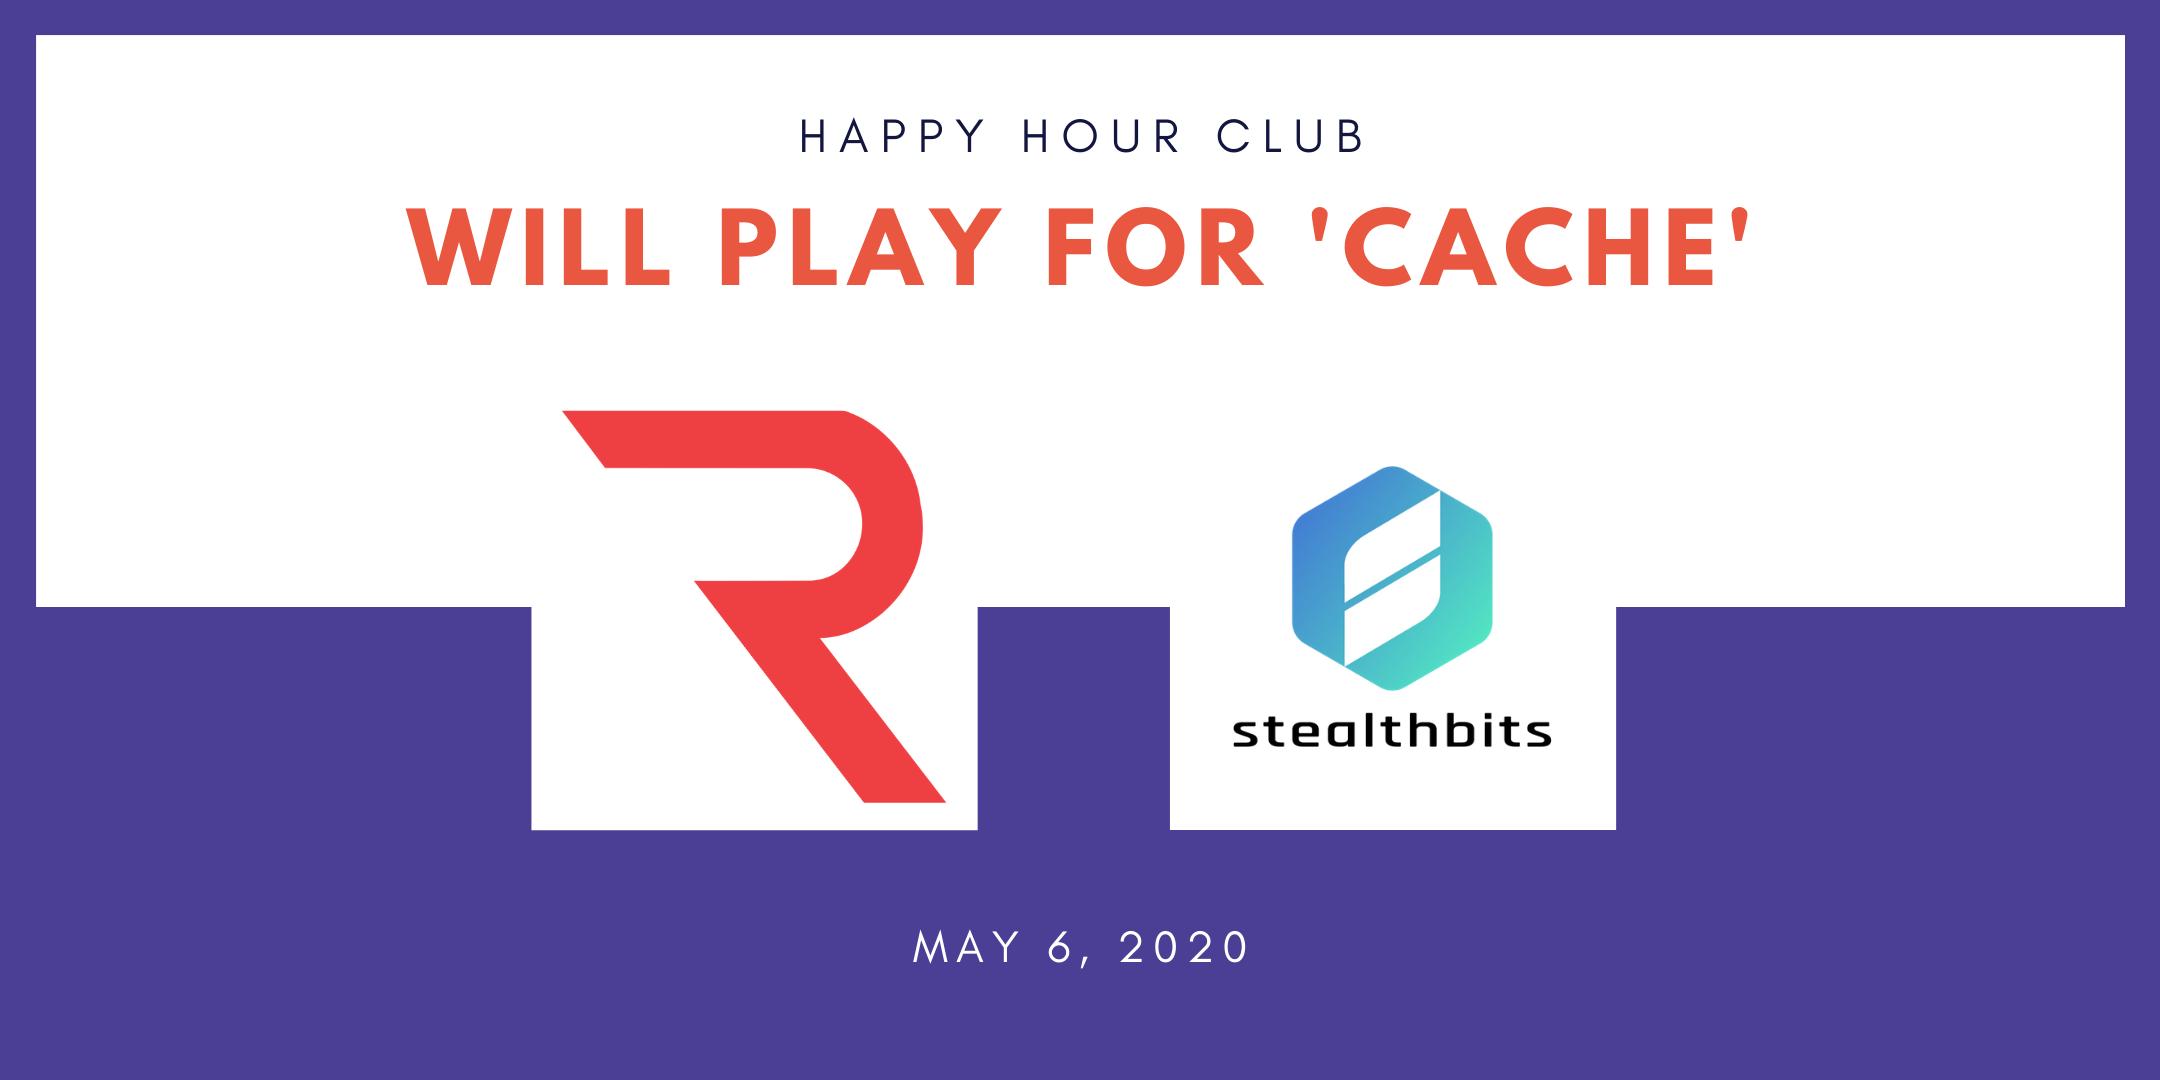 Happy-Hour-Club-050620